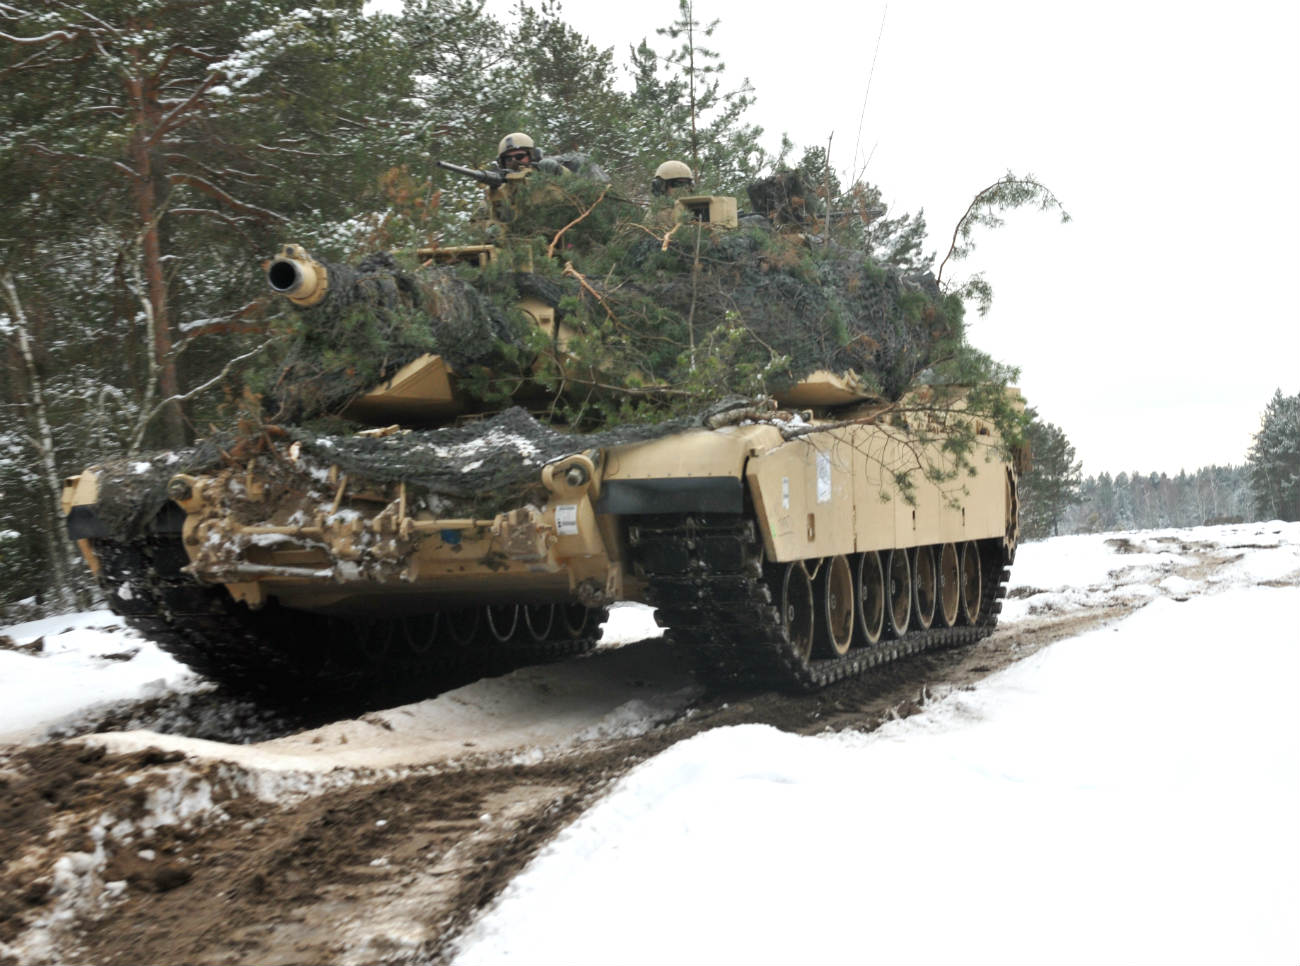 M1 Abrams tank camo